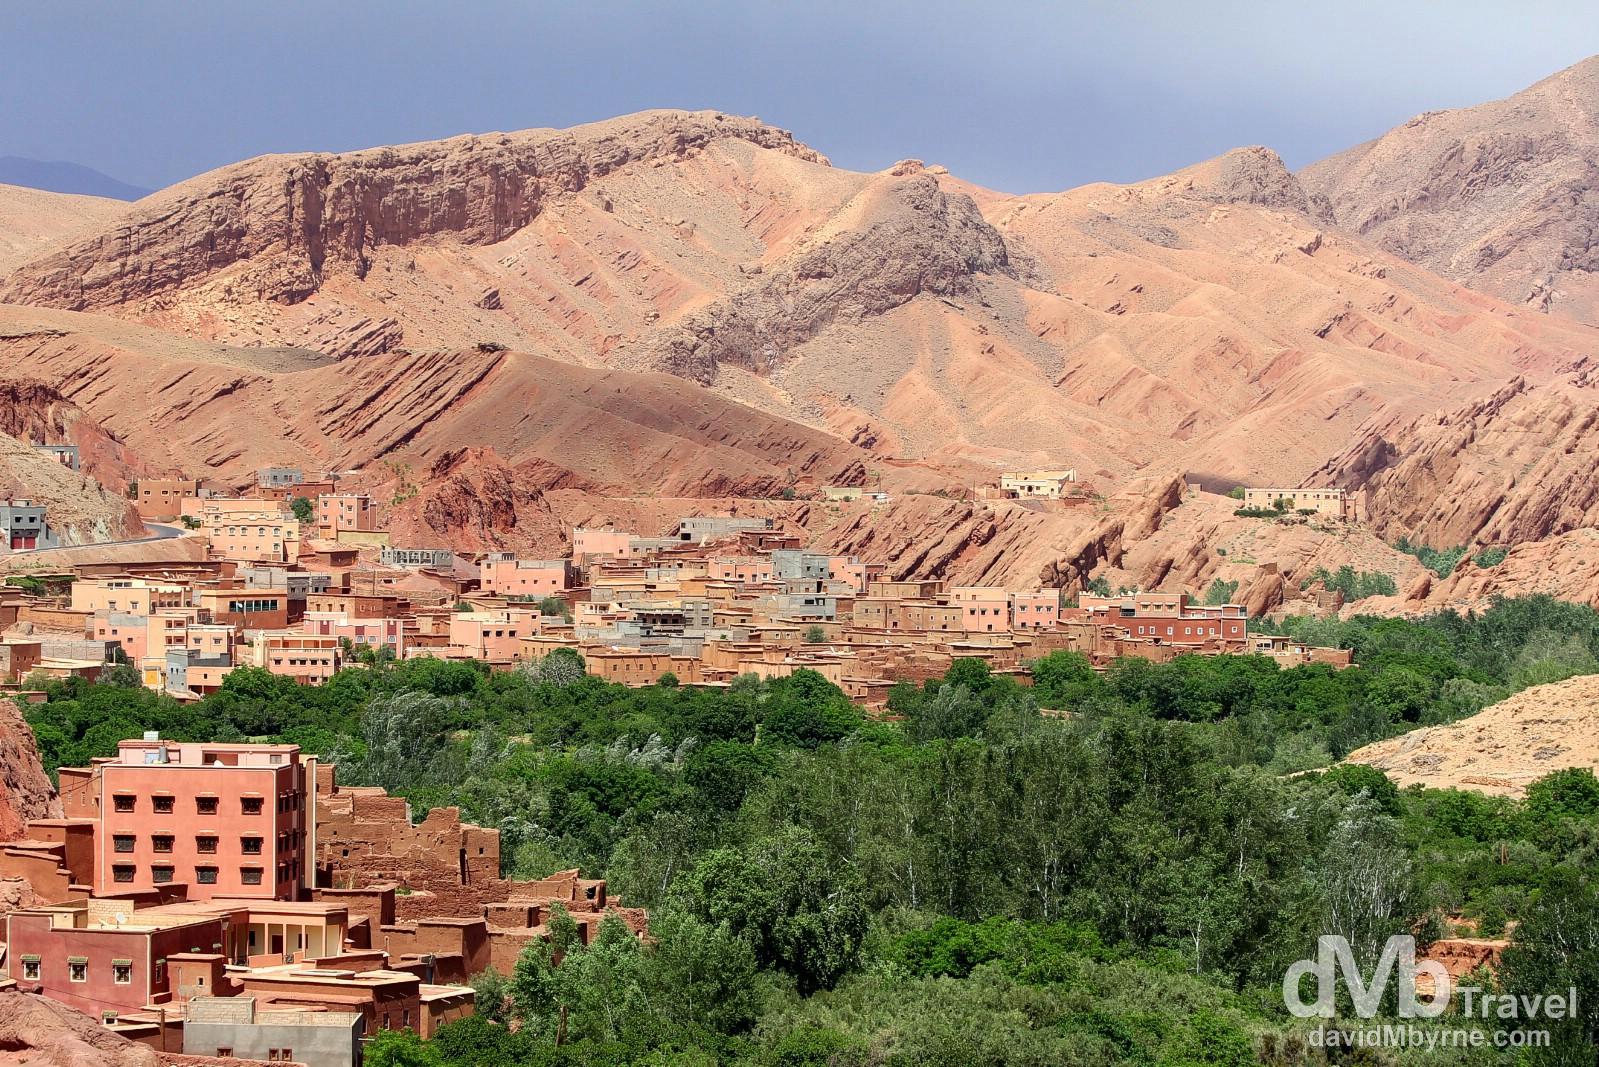 Dades & Todra Gorge, Morocco